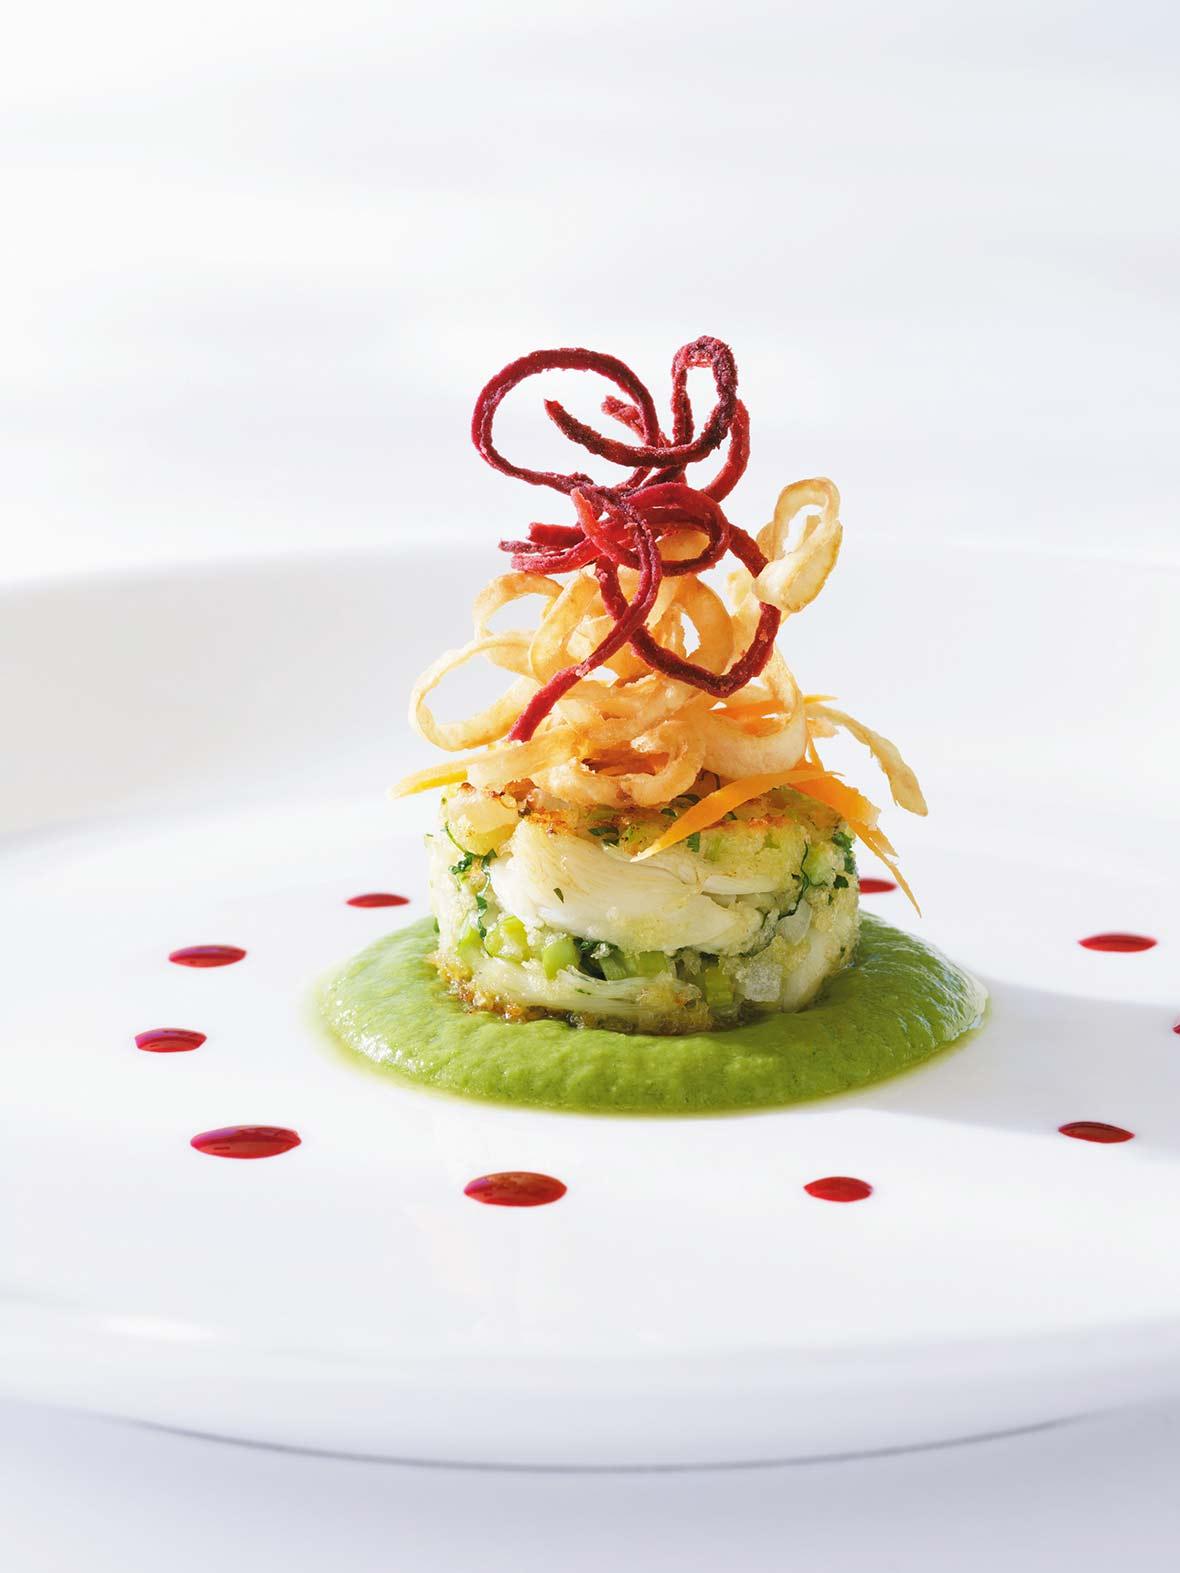 crab-cakes-avocado-habanero-sauce.jpg